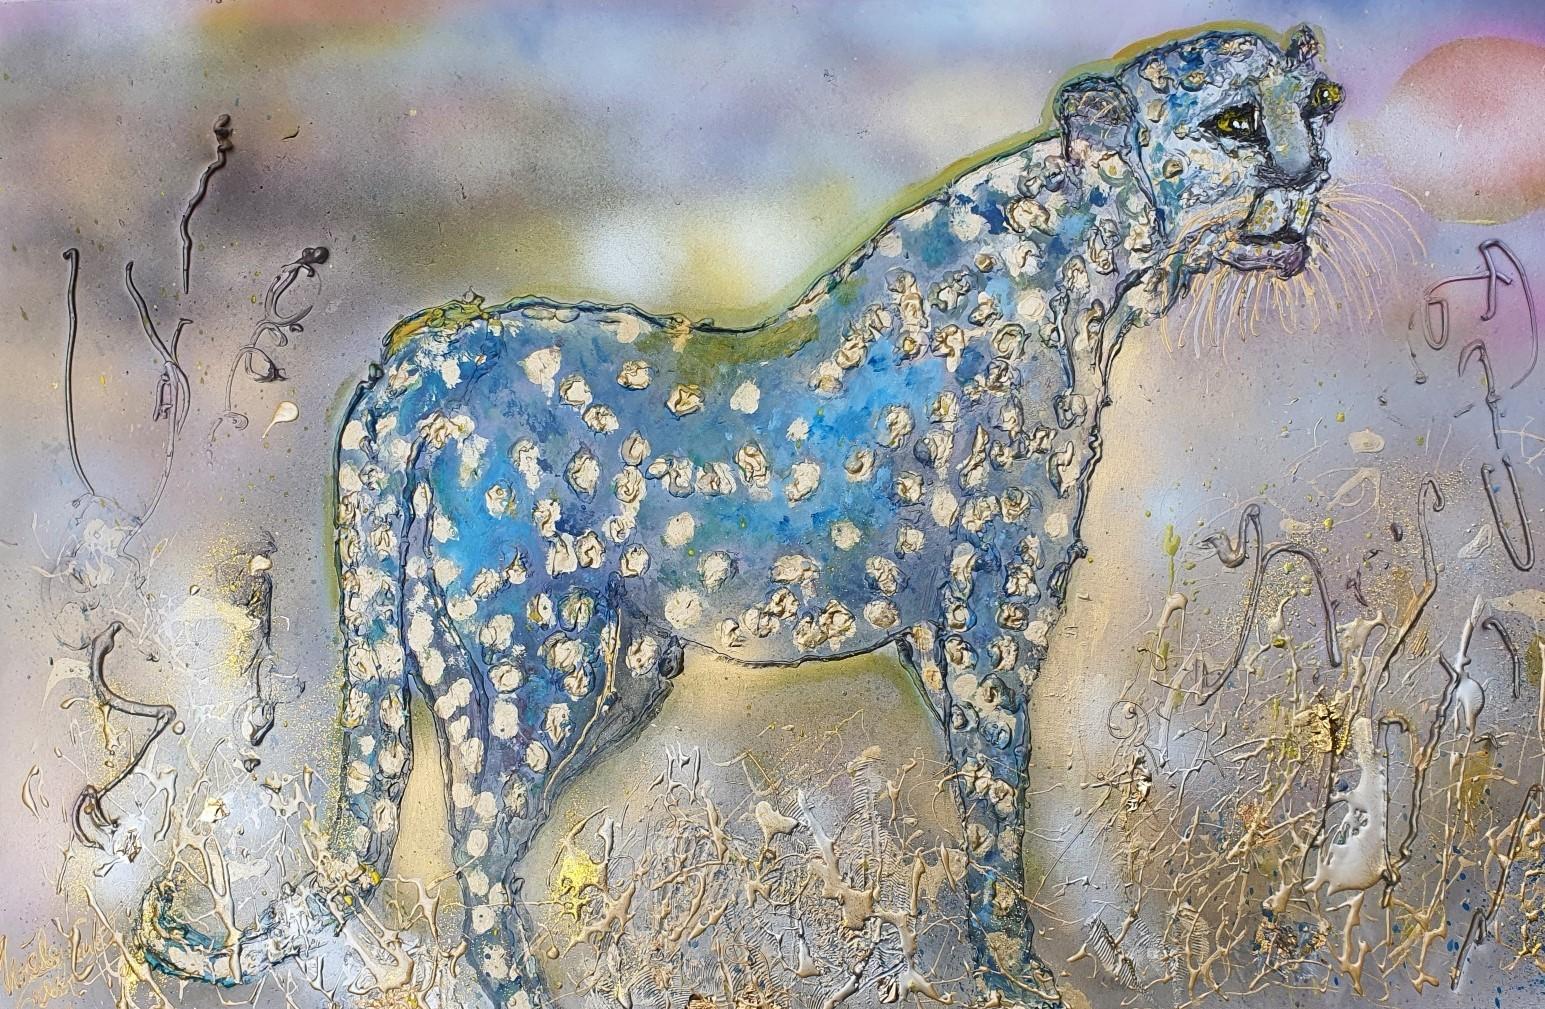 everyone's  a winner  (Technic: Acryl, Papergold 24 Karat) Mixed Media on Canvas 115 X 75 X 1,5 cm